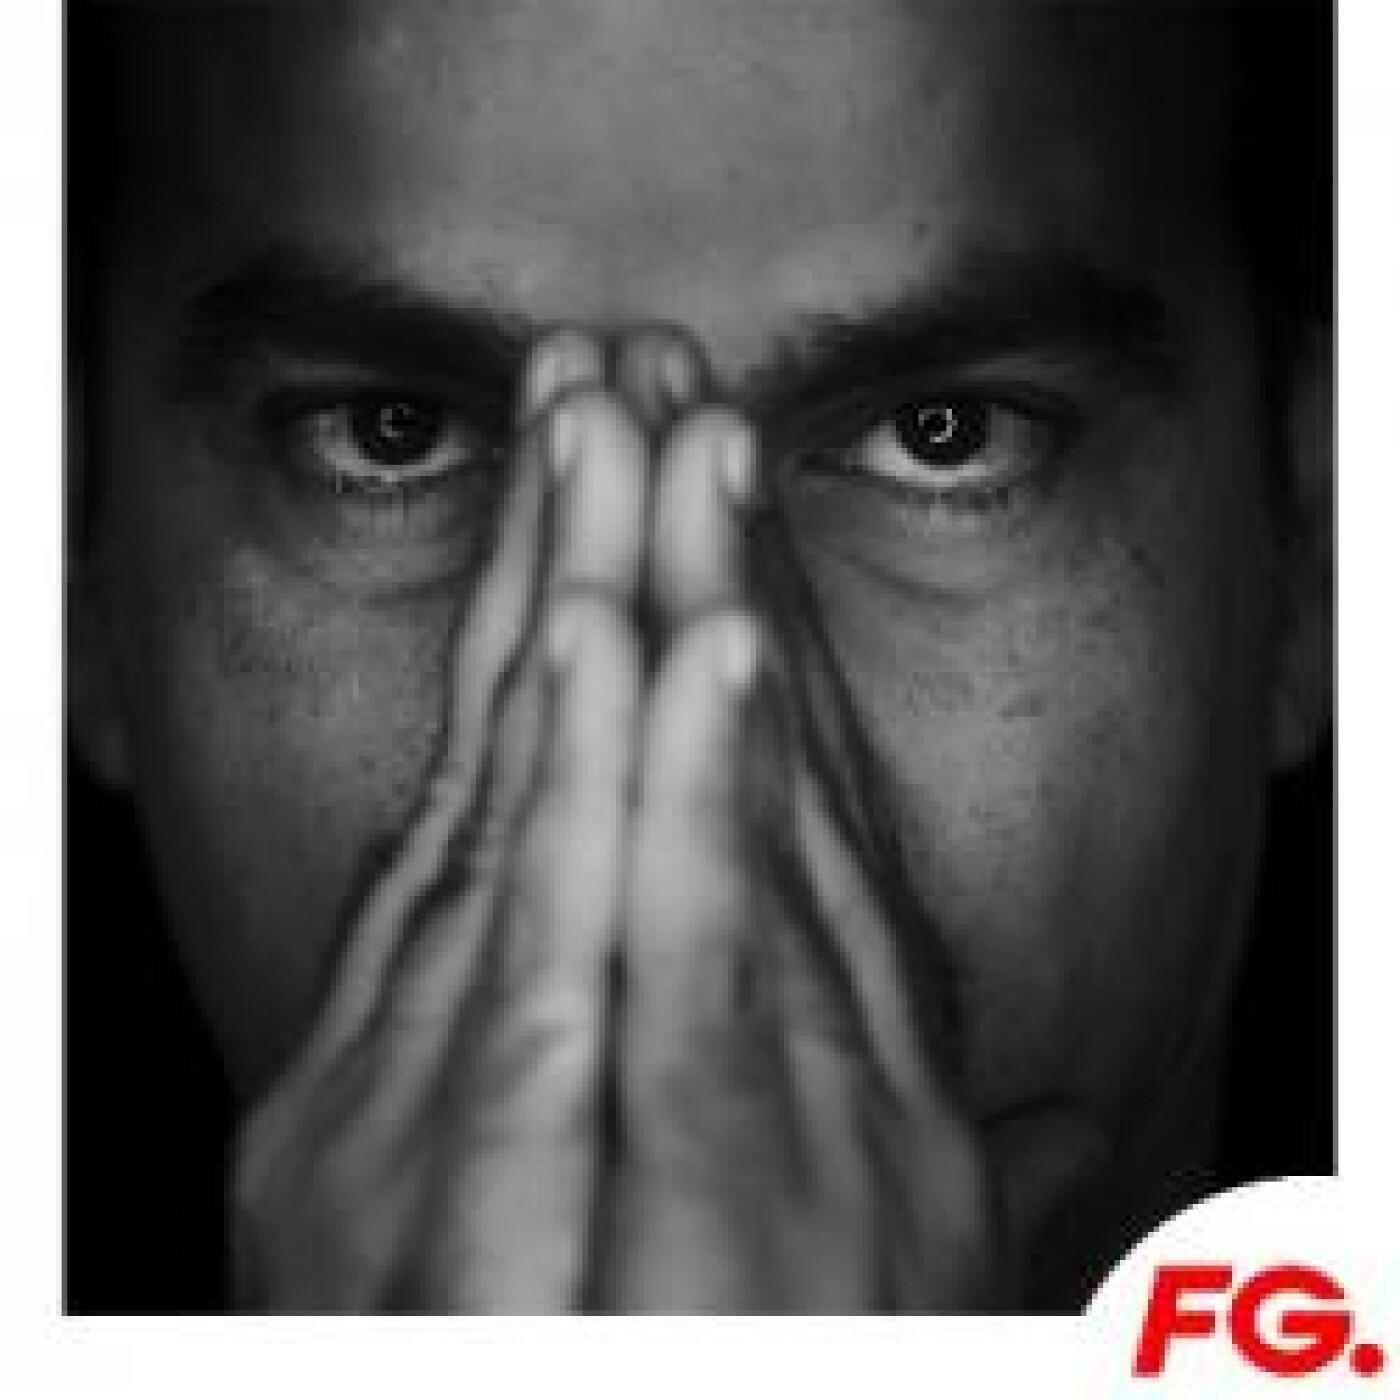 CLUB FG : MONSIEUR BART